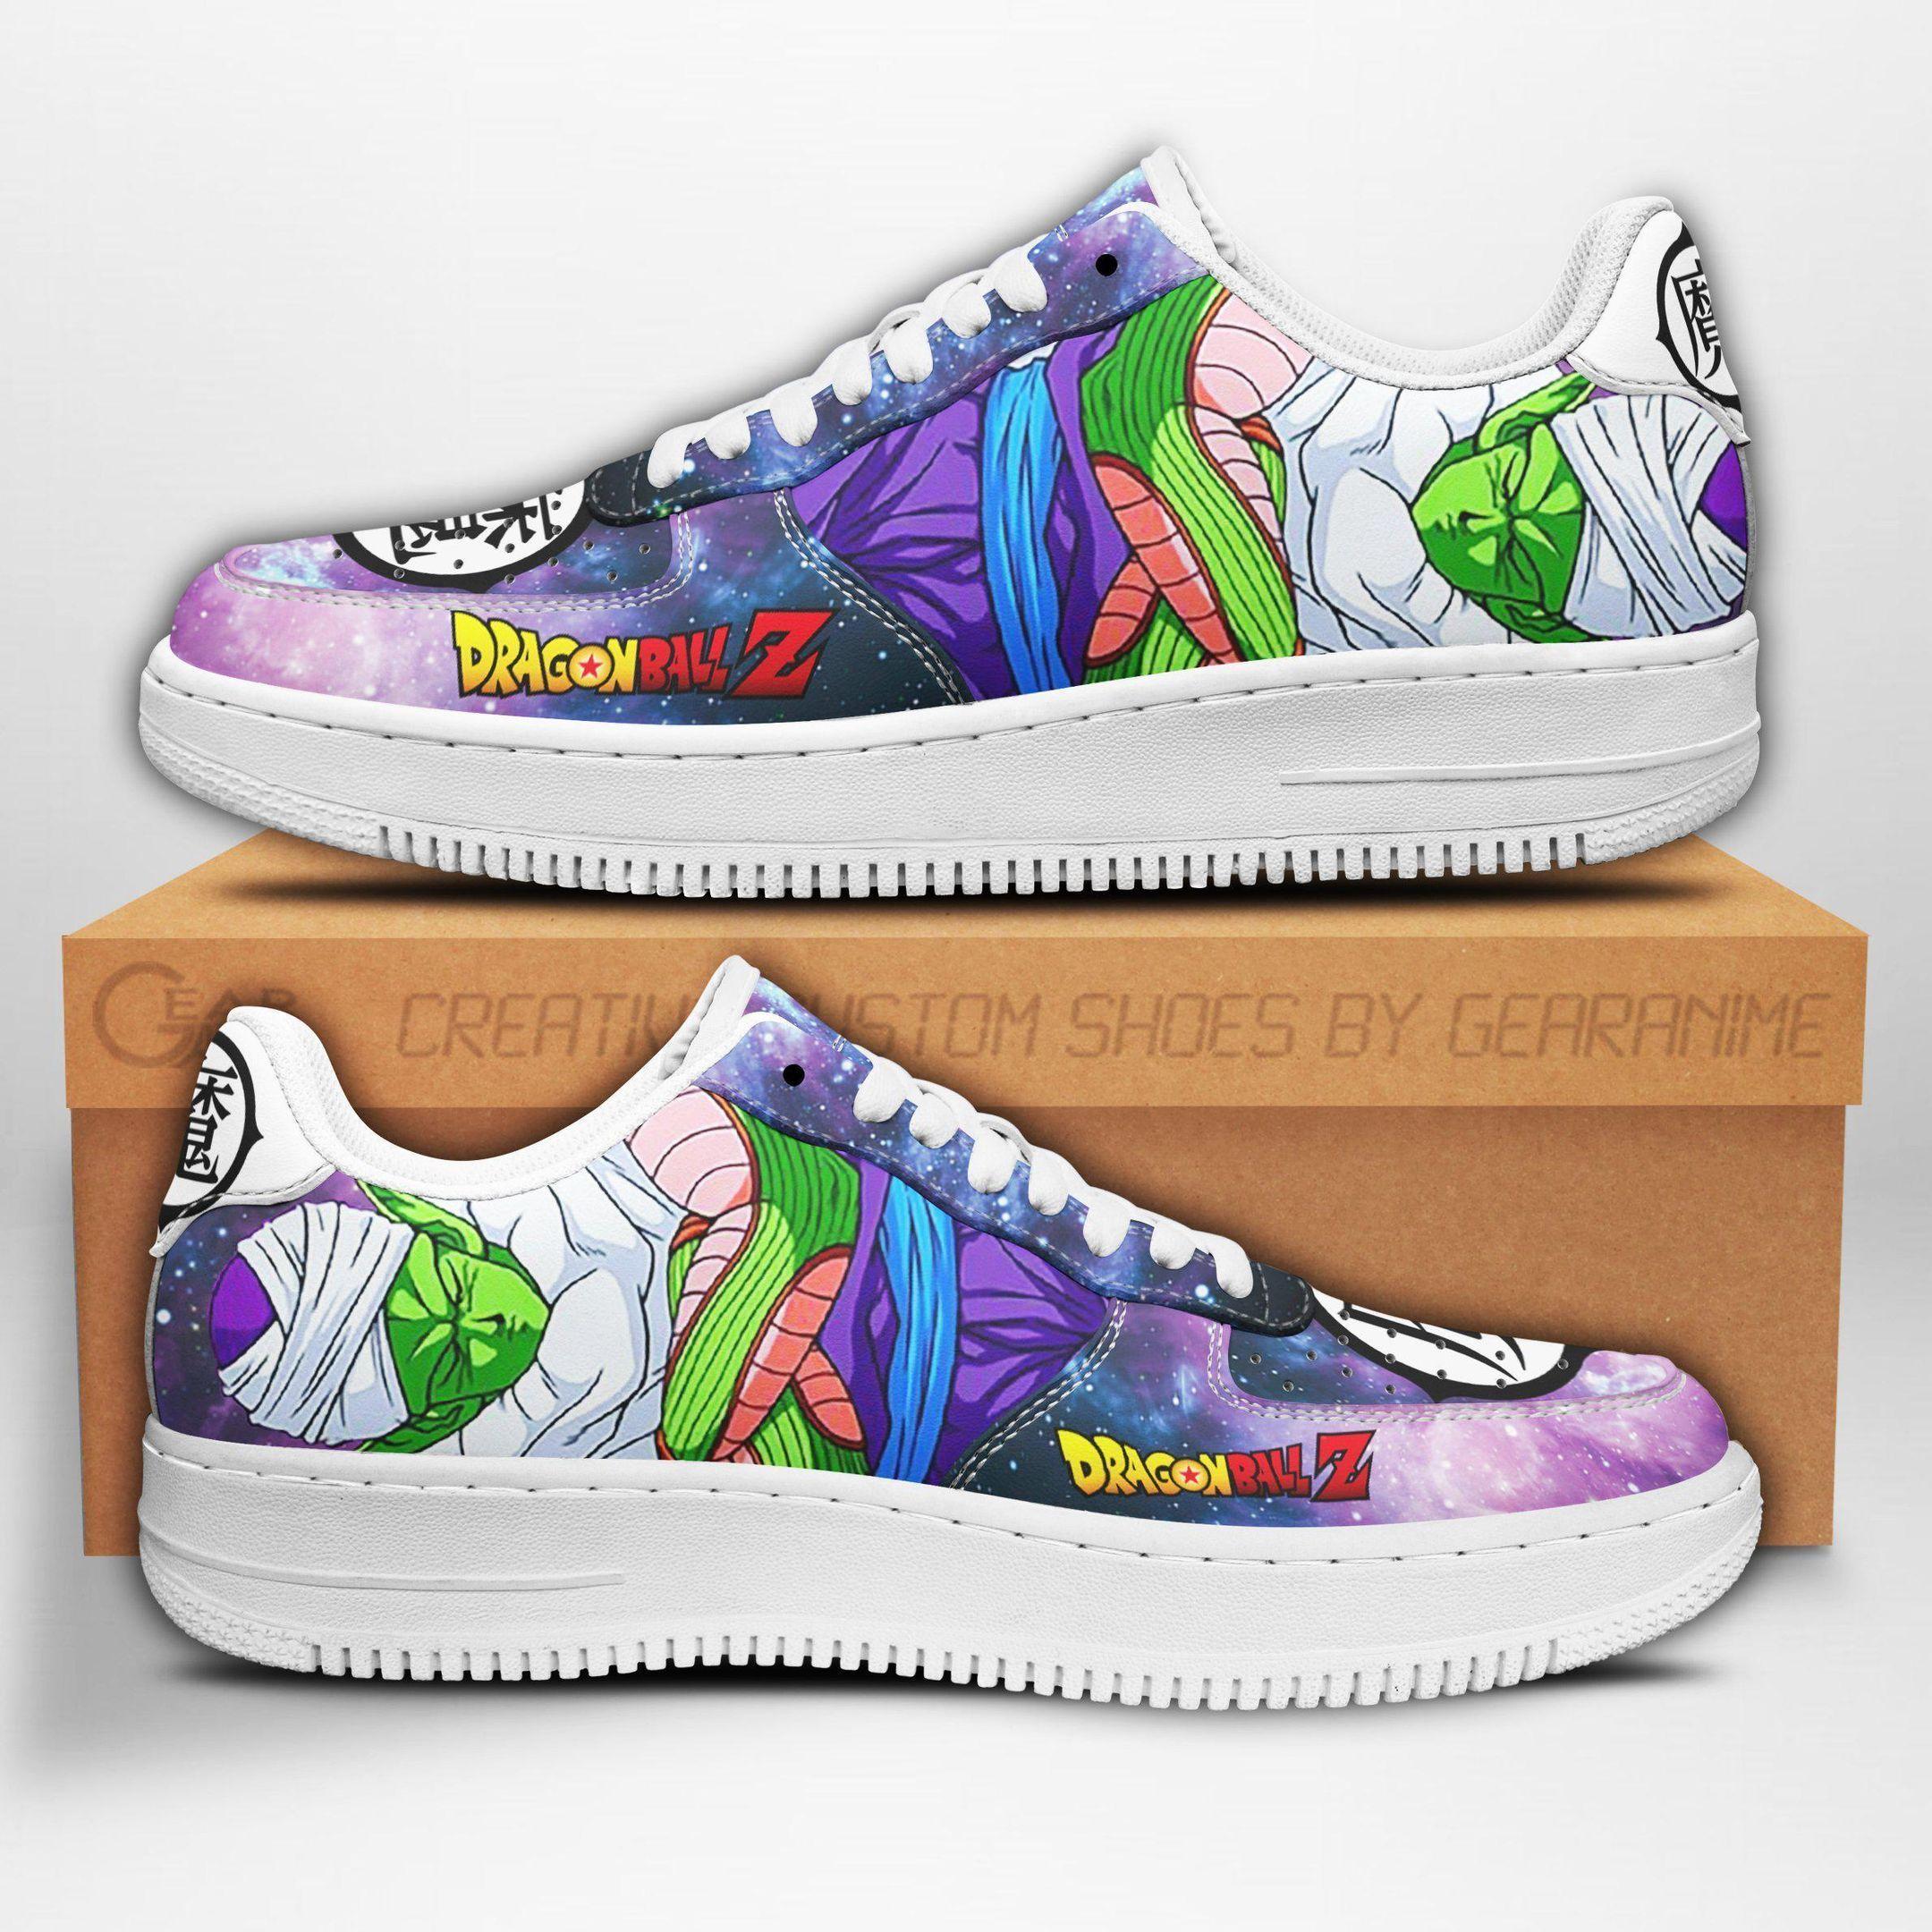 Piccolo Air Shoes Dragon Ball Z Anime Shoes Fan Gift GO1012